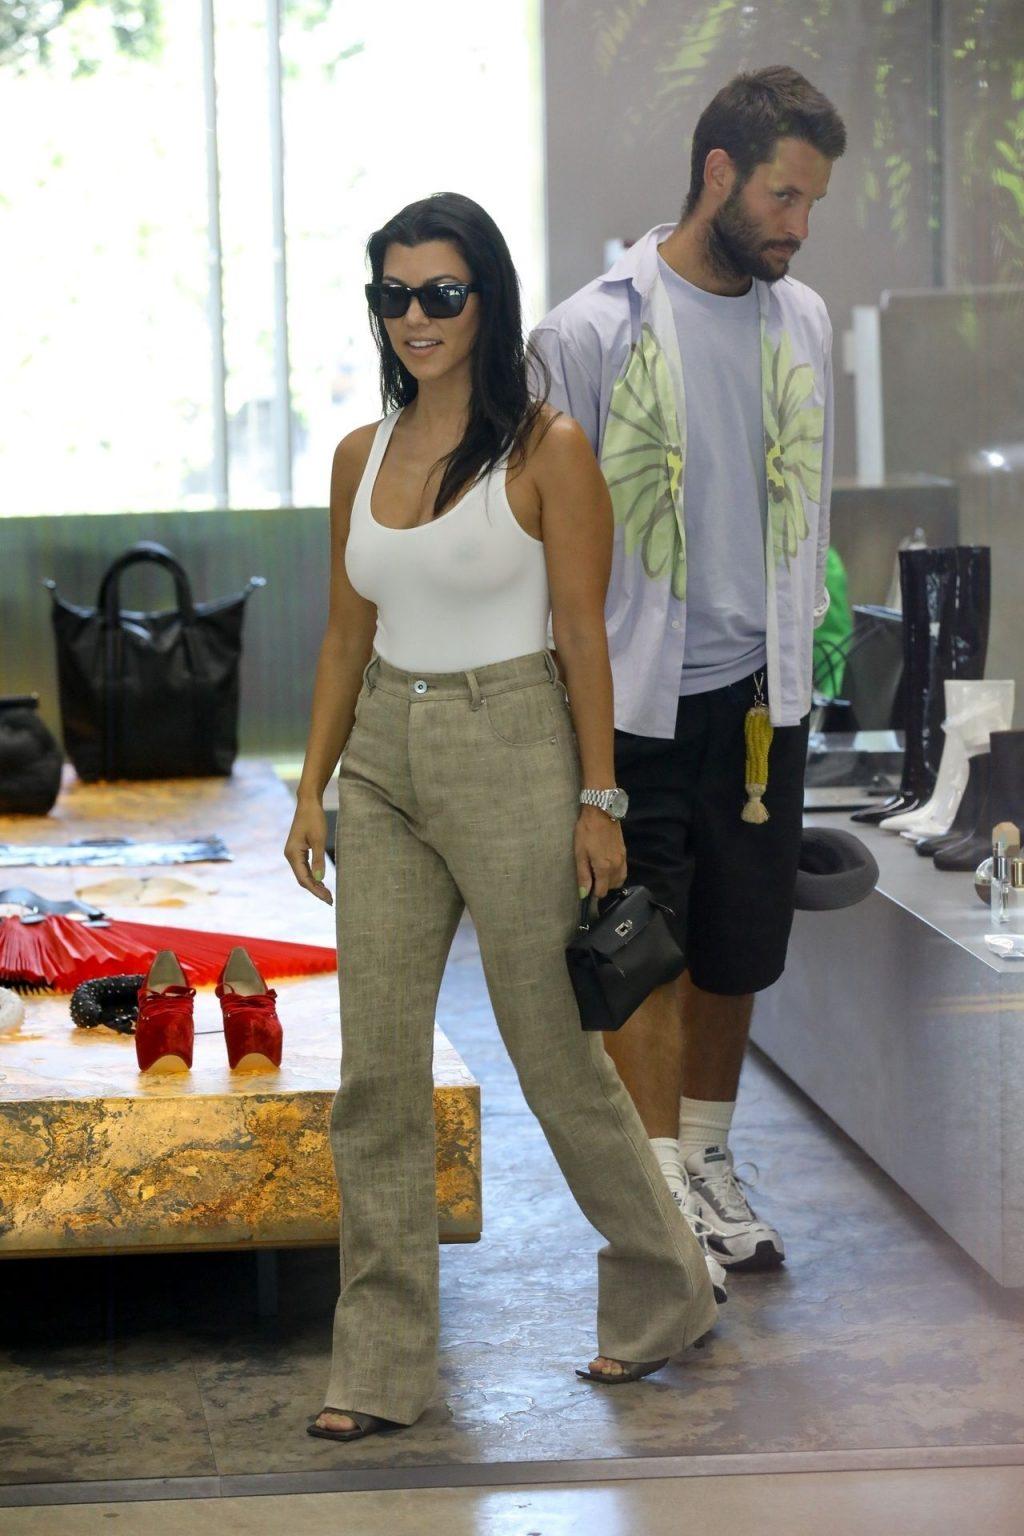 Kourtney Kardashian See Through Thefappeningblog Com 142 102